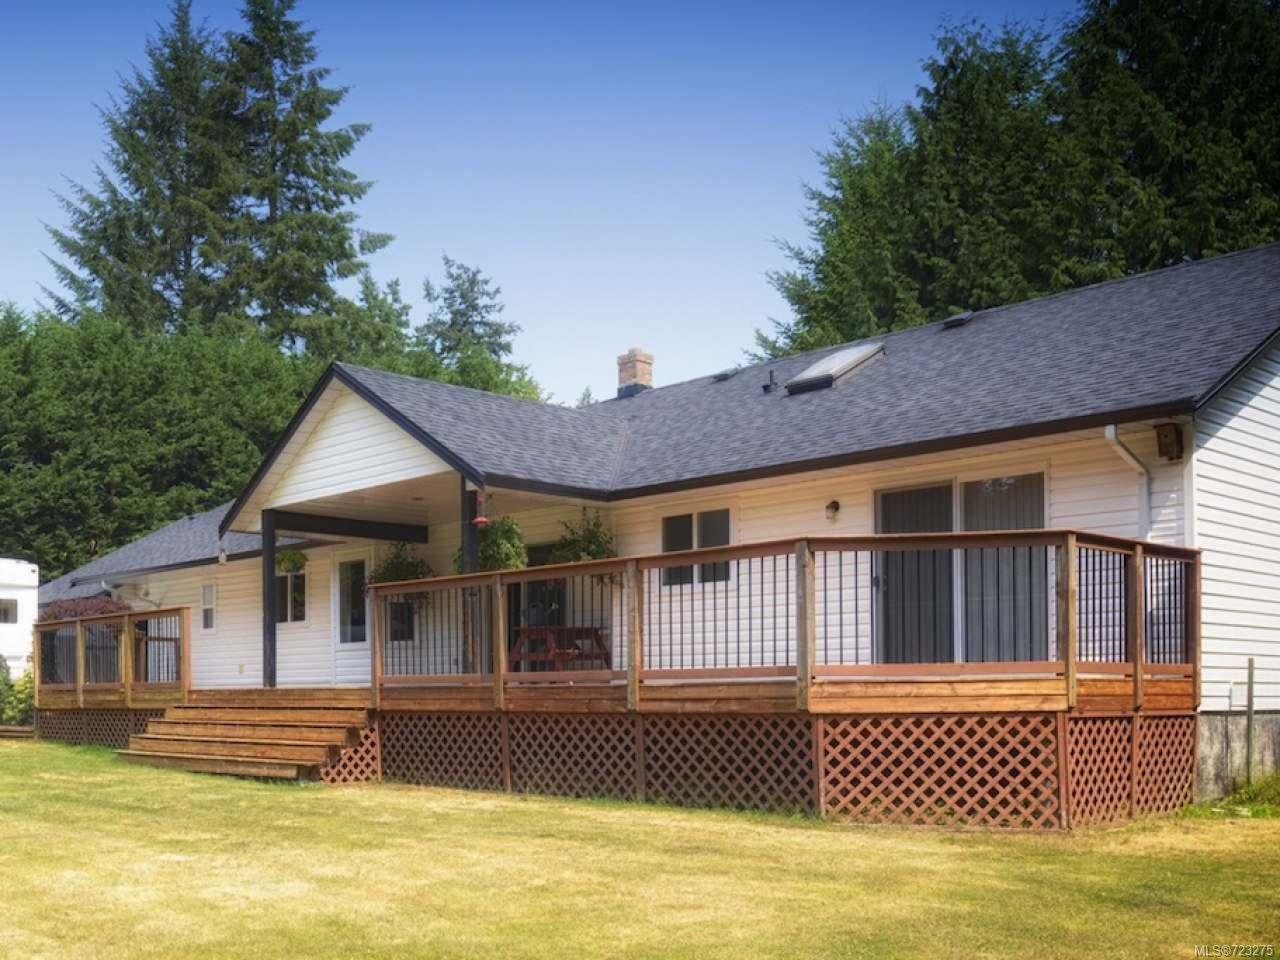 Main Photo: 5125 Willis Way in COURTENAY: CV Courtenay North House for sale (Comox Valley)  : MLS®# 723275